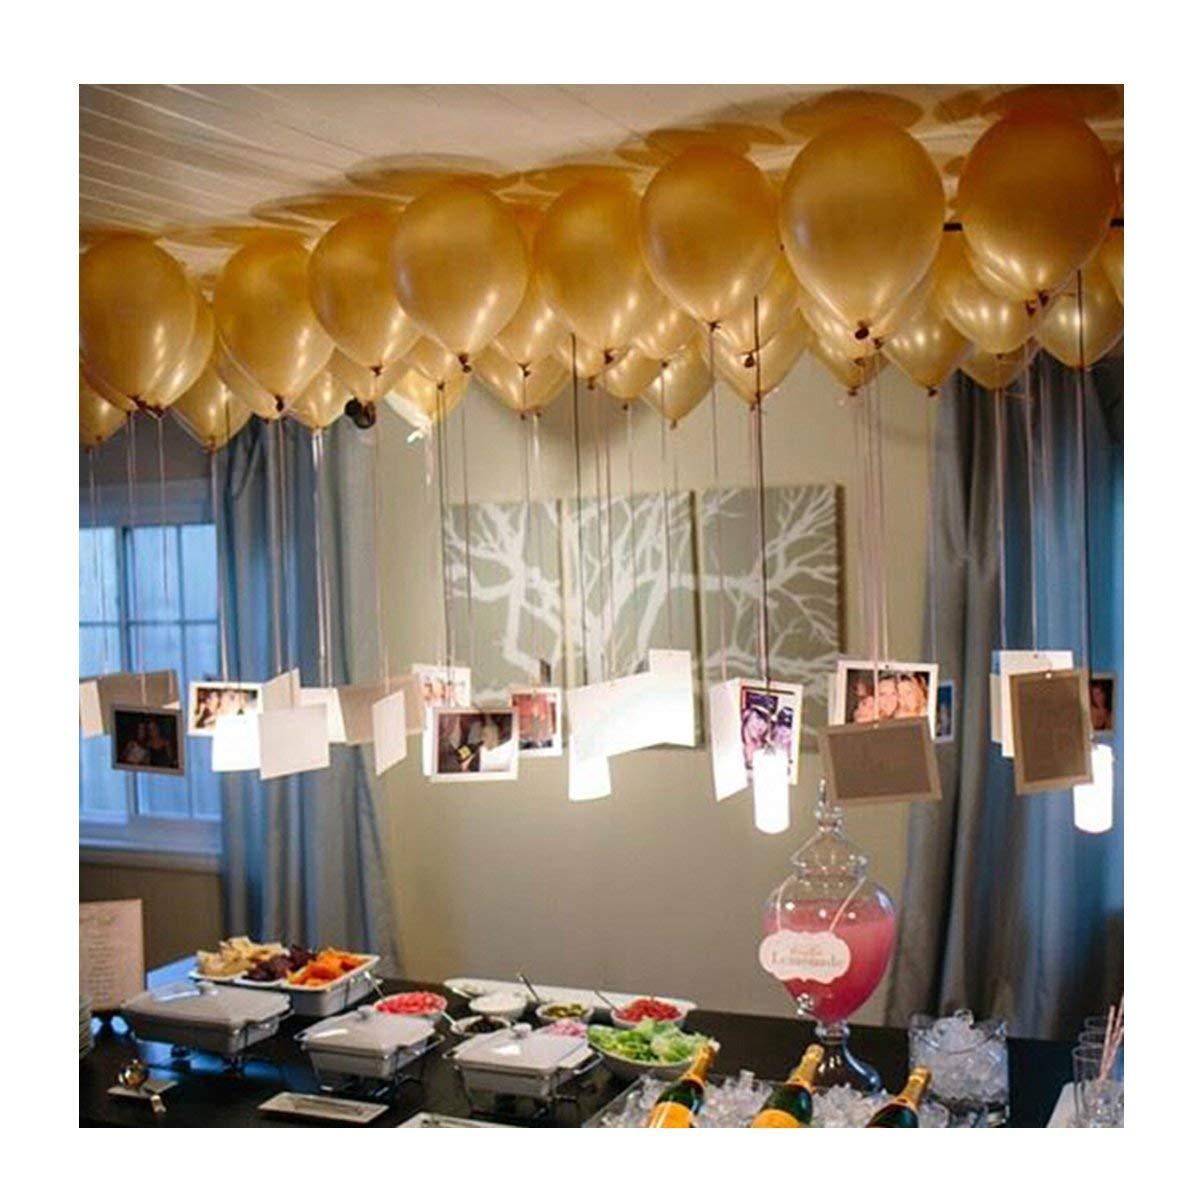 Black Huayao 100PCS Shiny Pearl 12inch Latex Balloon Thicken For Birthday Wedding Party Decoration